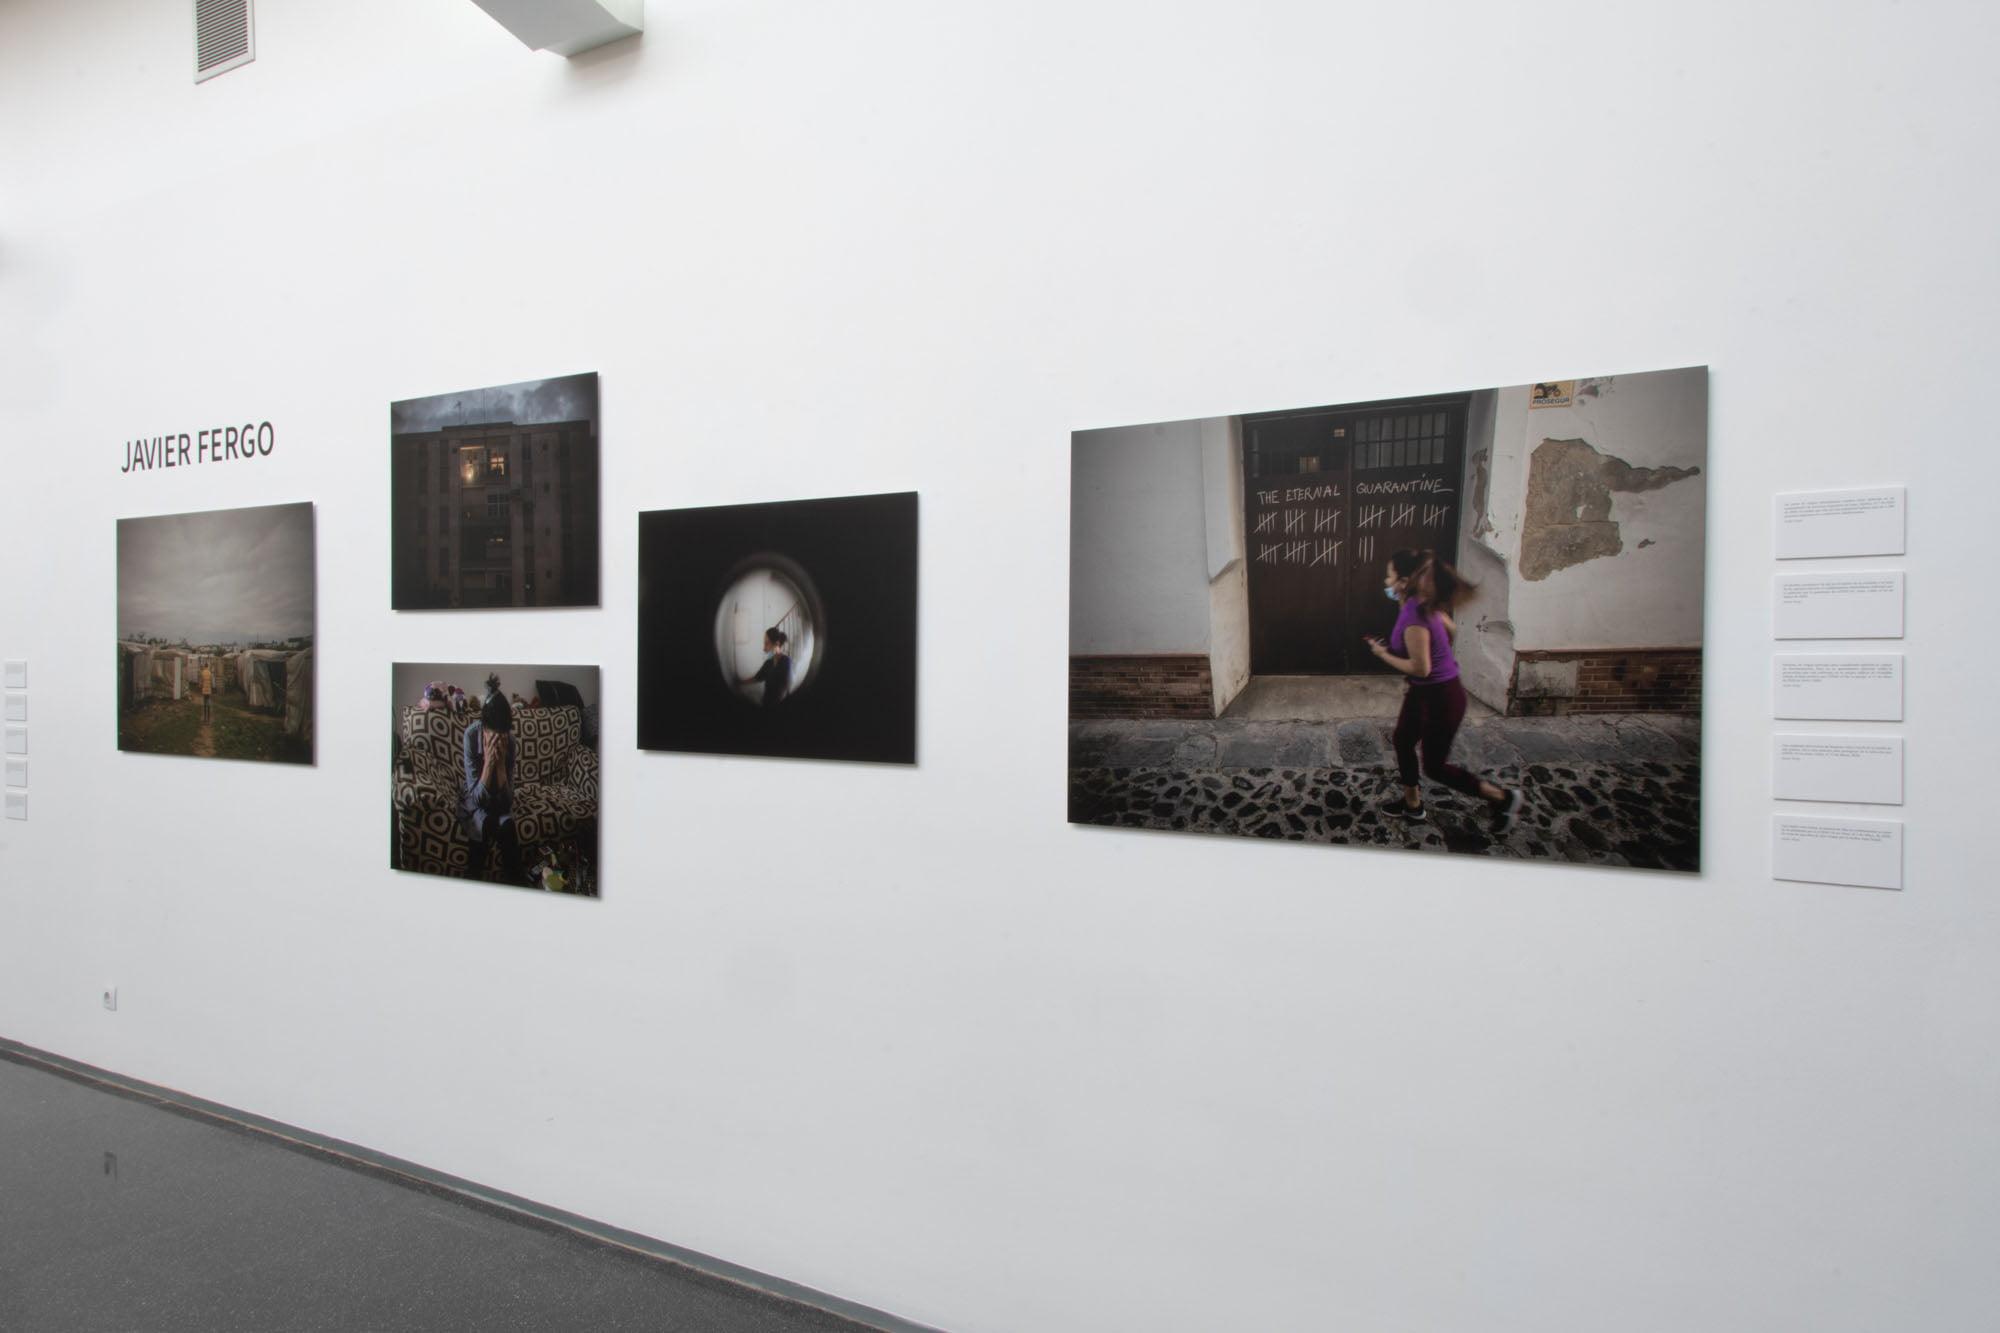 Work of Javier Fergo